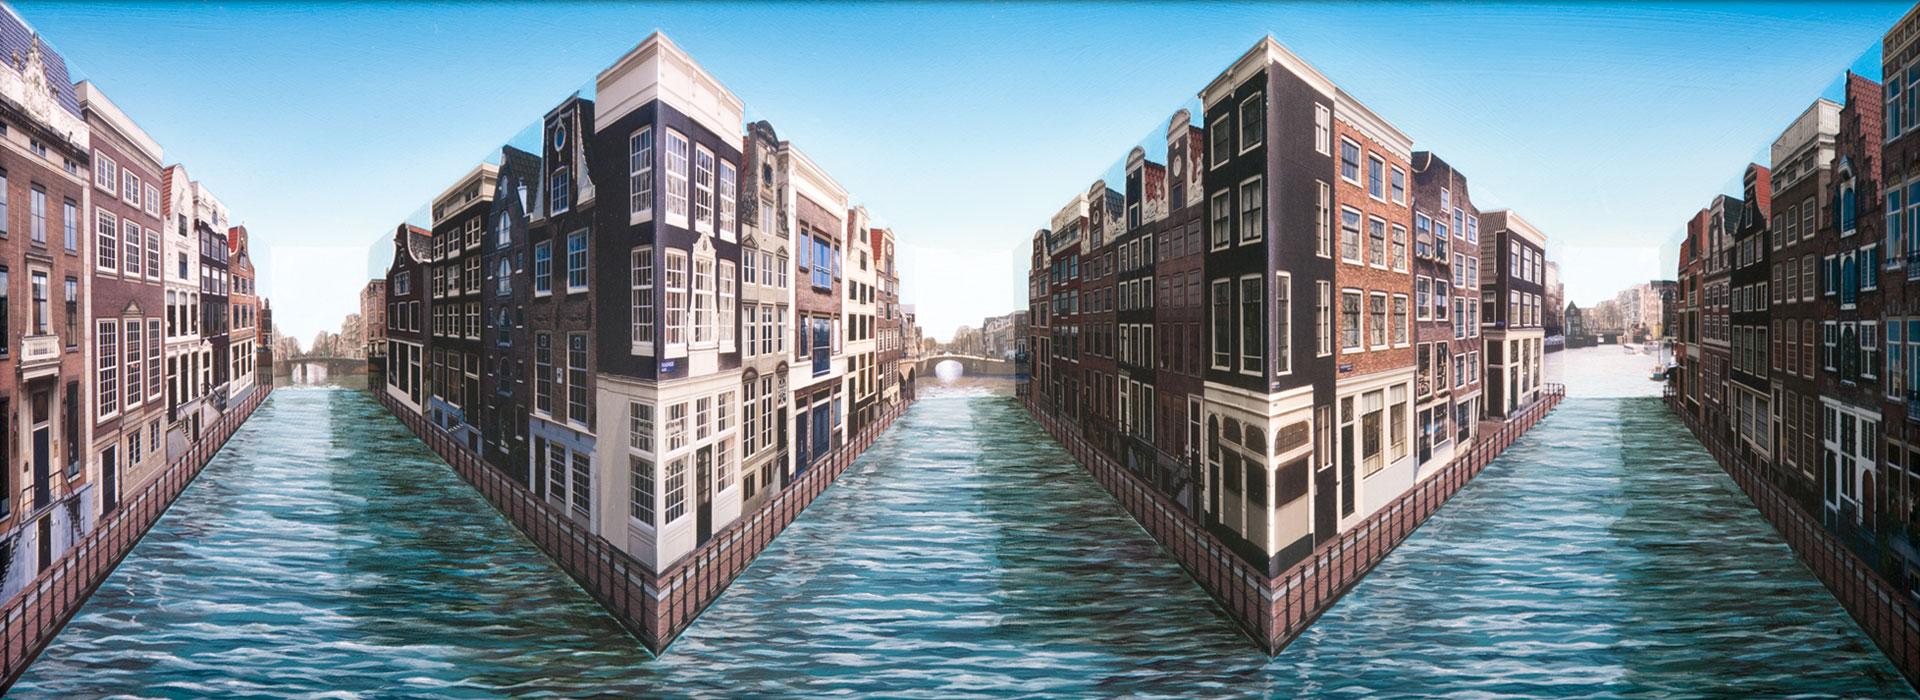 Patrick Hughes - 'Waterways' 2014 - 47 x 94 x 12